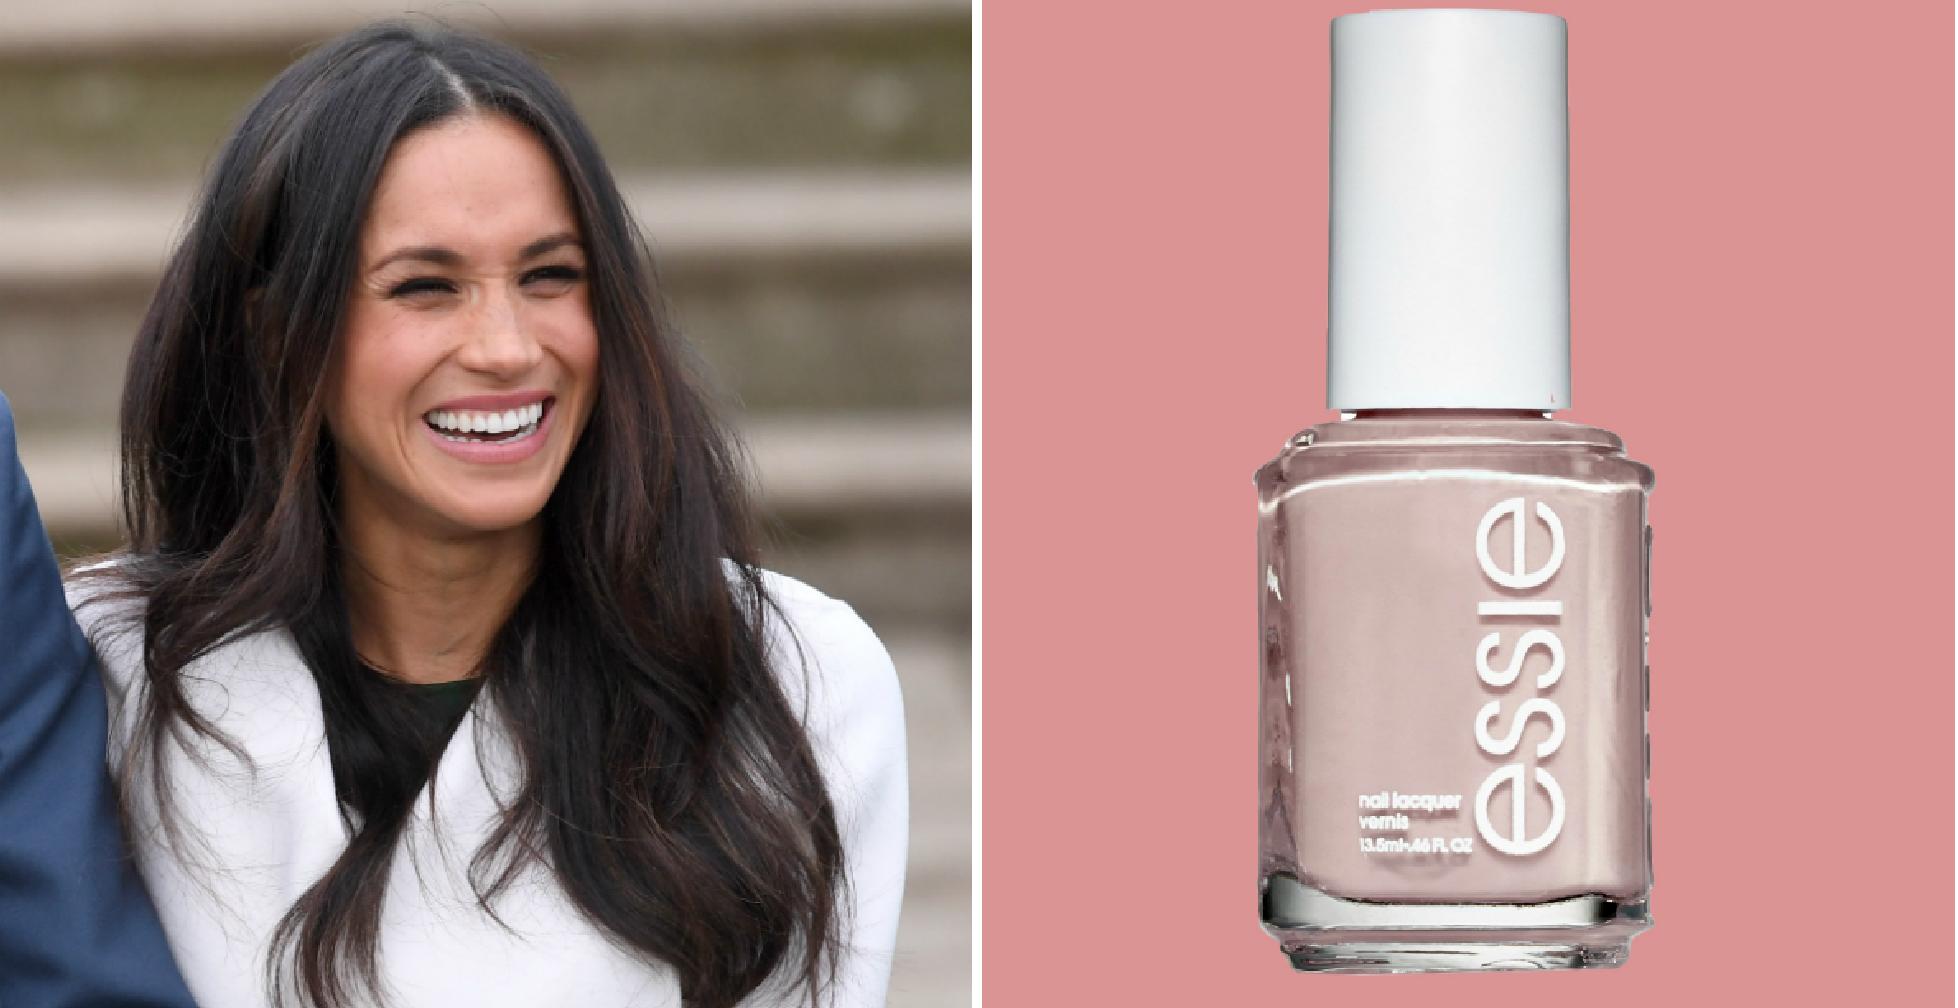 Did Meghan Markle's New Nail Polish Color Break Royal BeautyProtocol